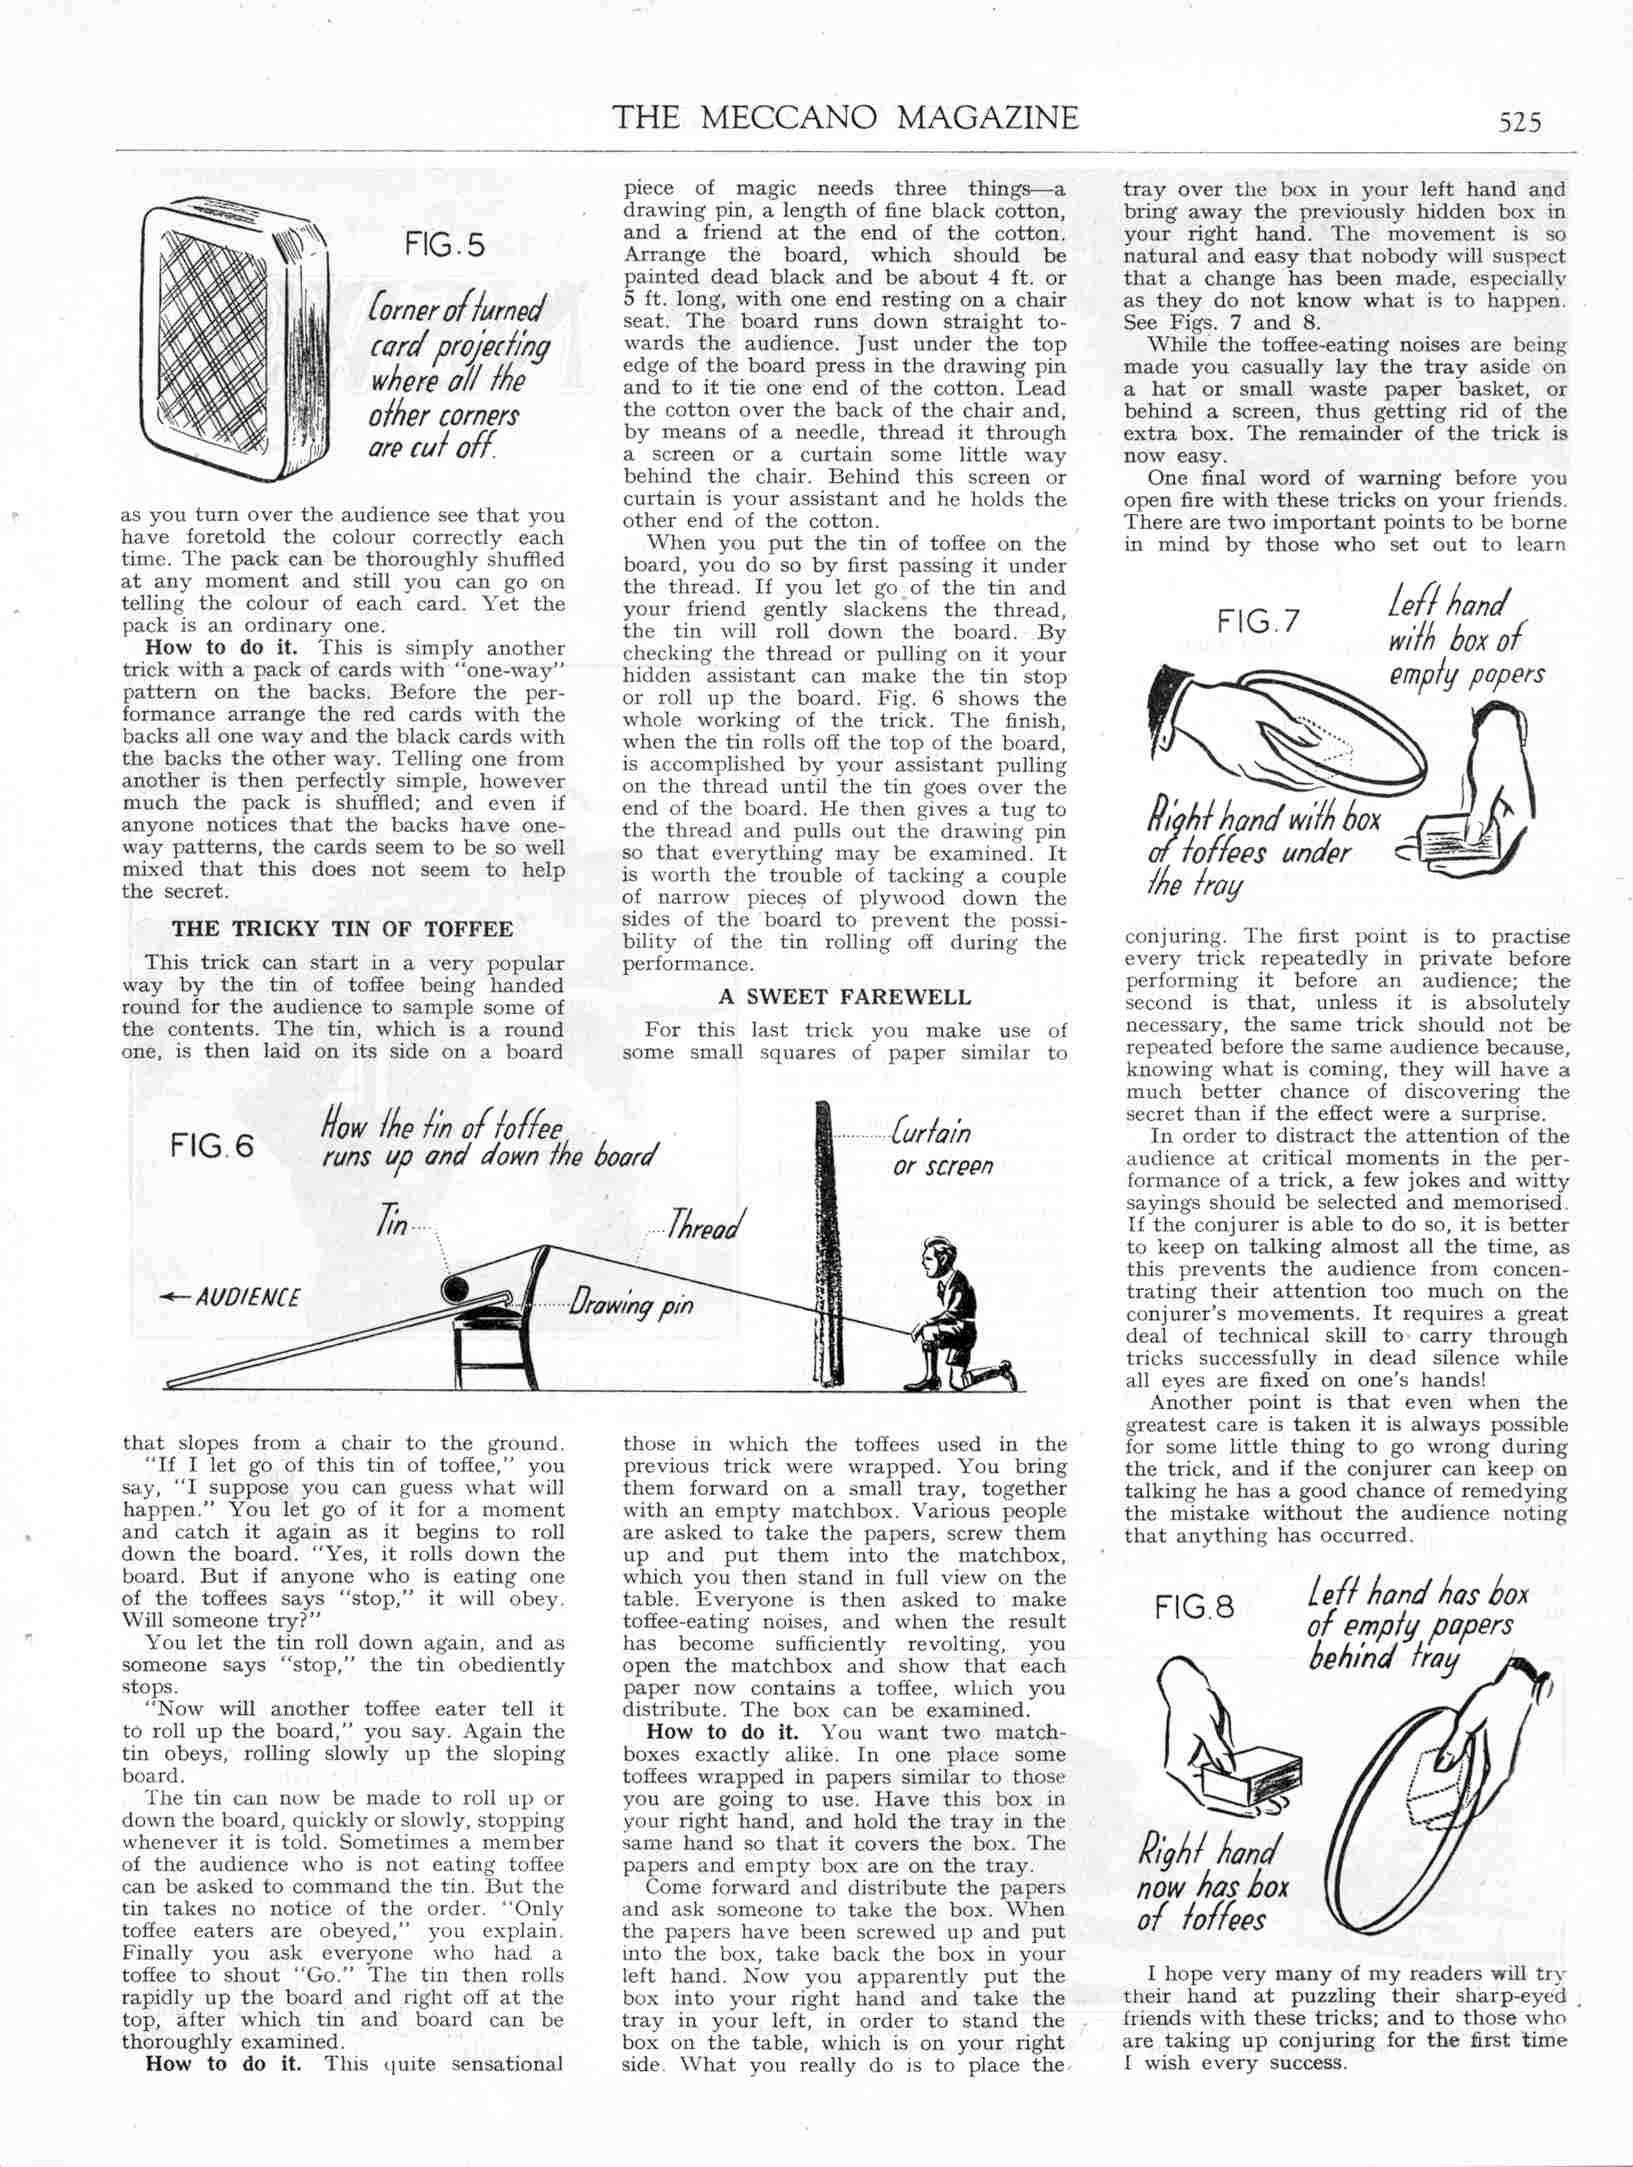 UK Meccano Magazine December 1940 Page 525